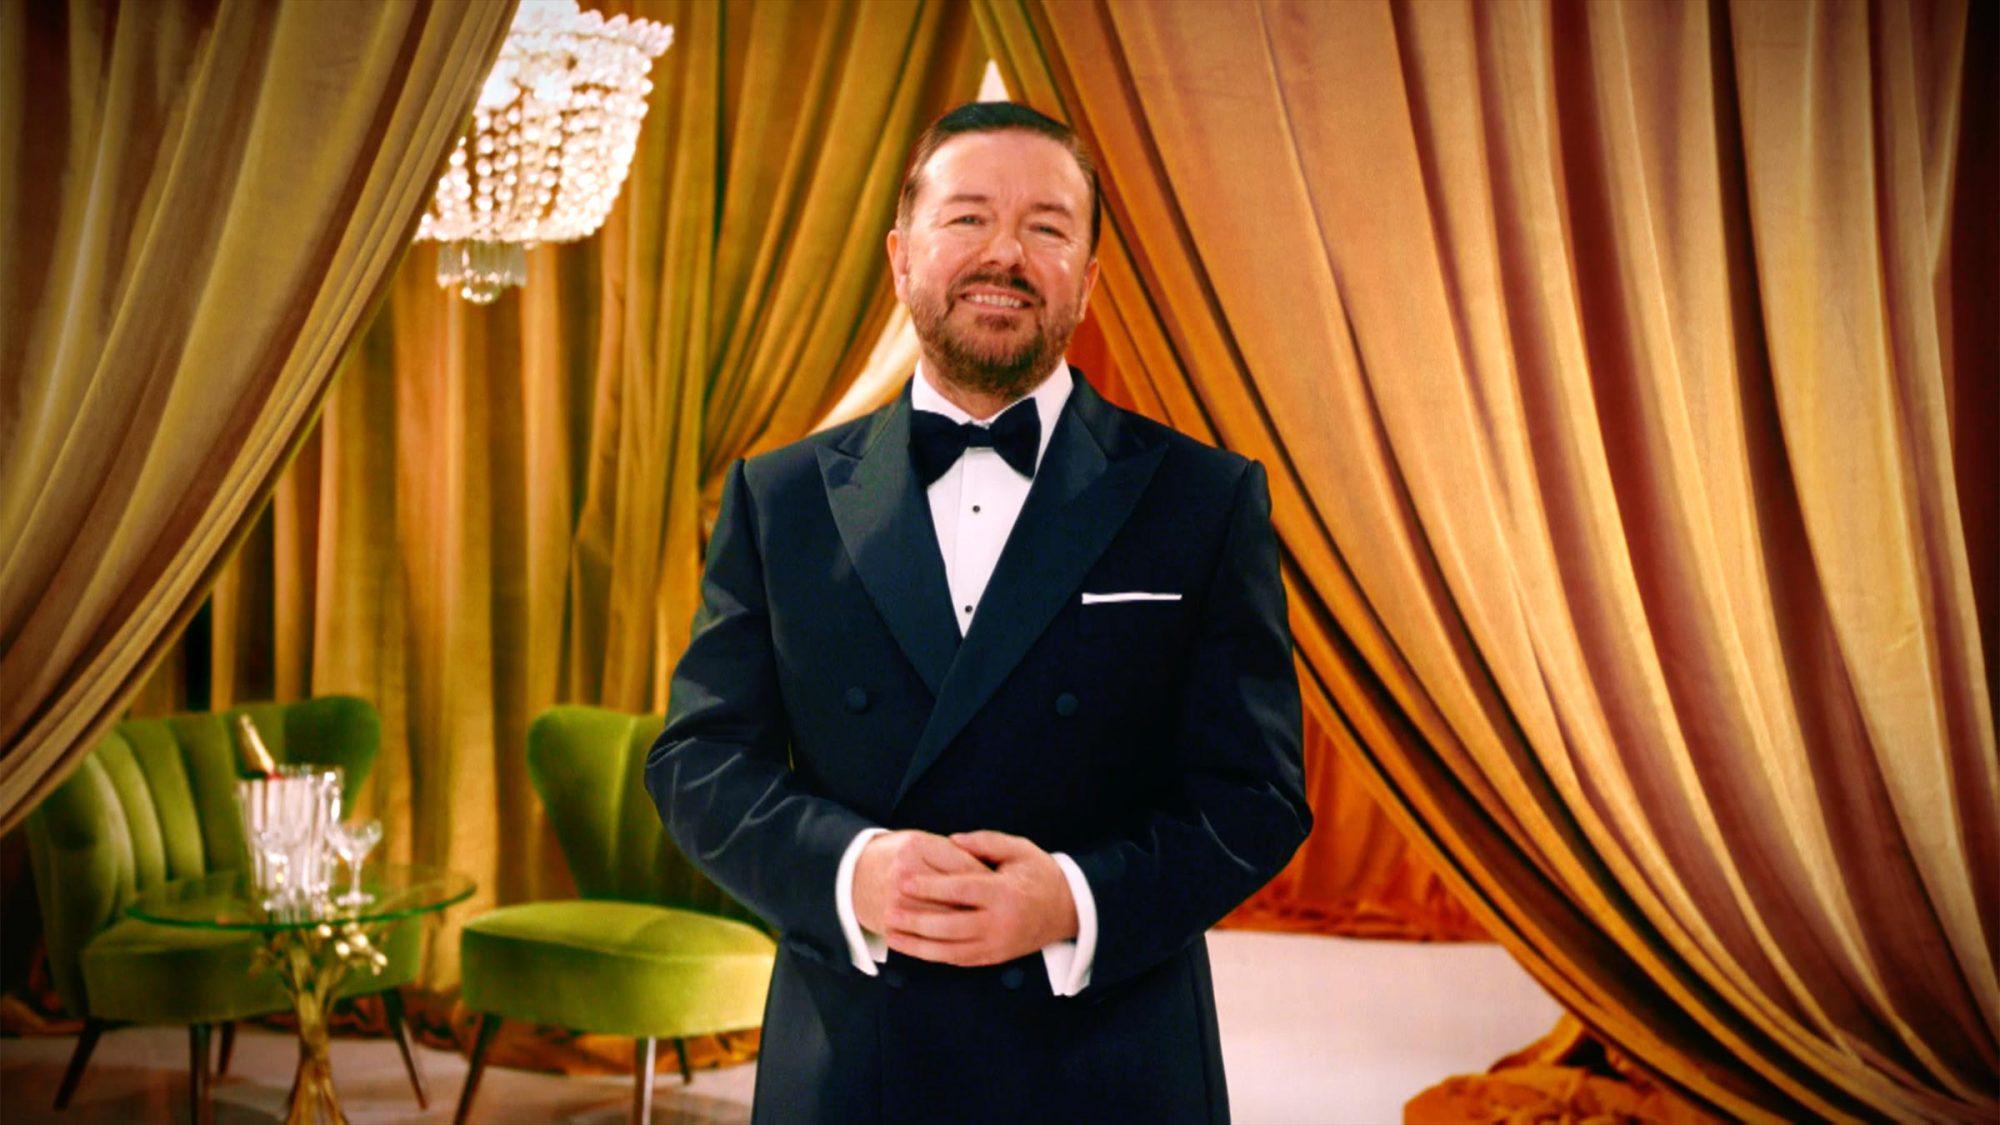 Rick Gervais